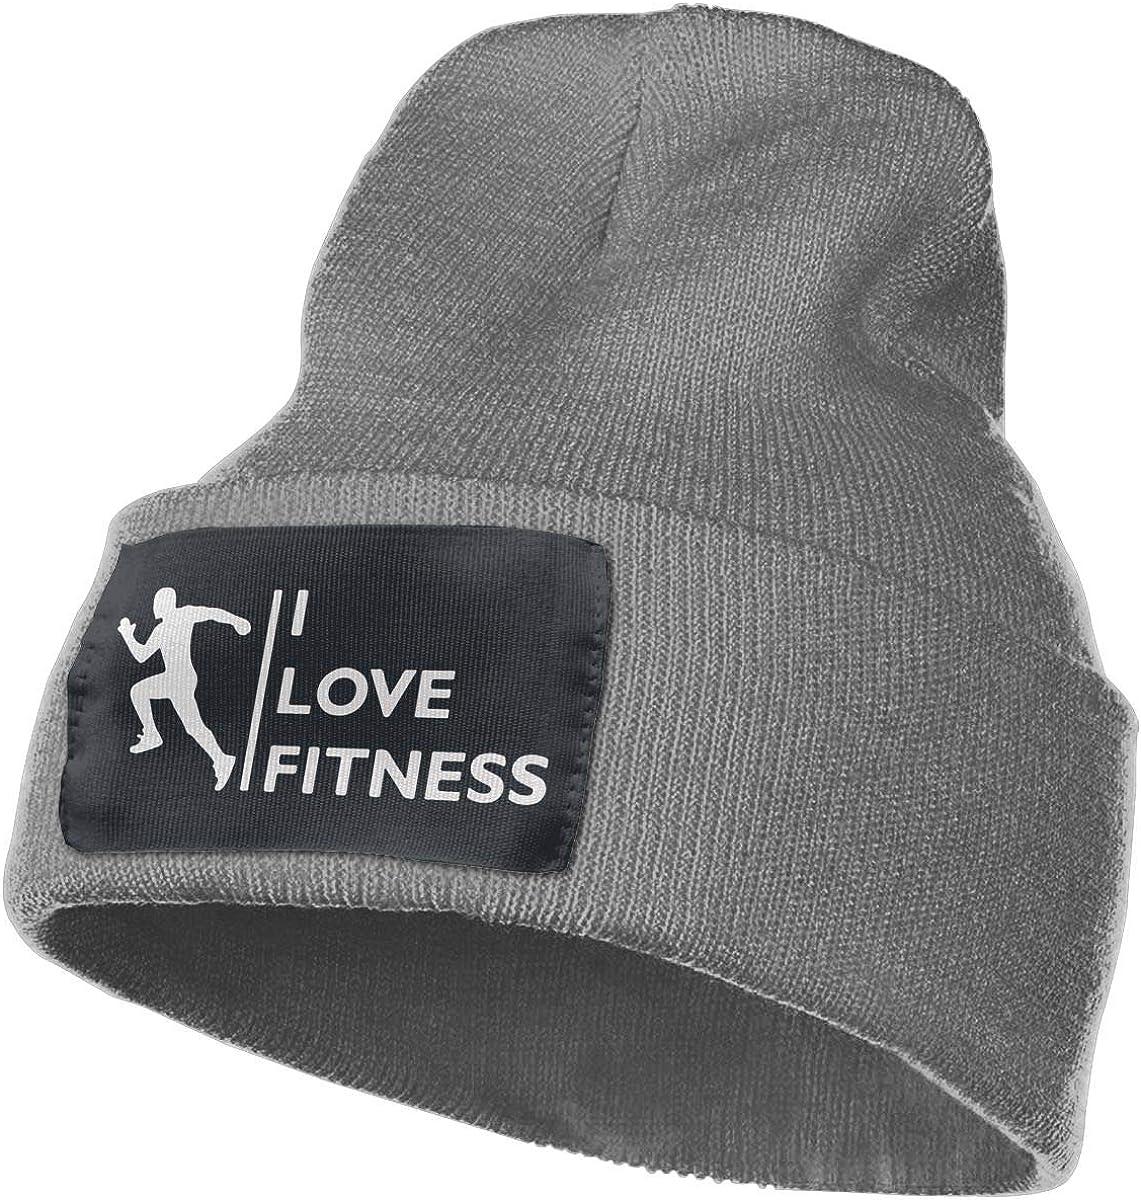 I Love Fitness Men /& Women Skull Caps Winter Warm Stretchy Knit Beanie Hats